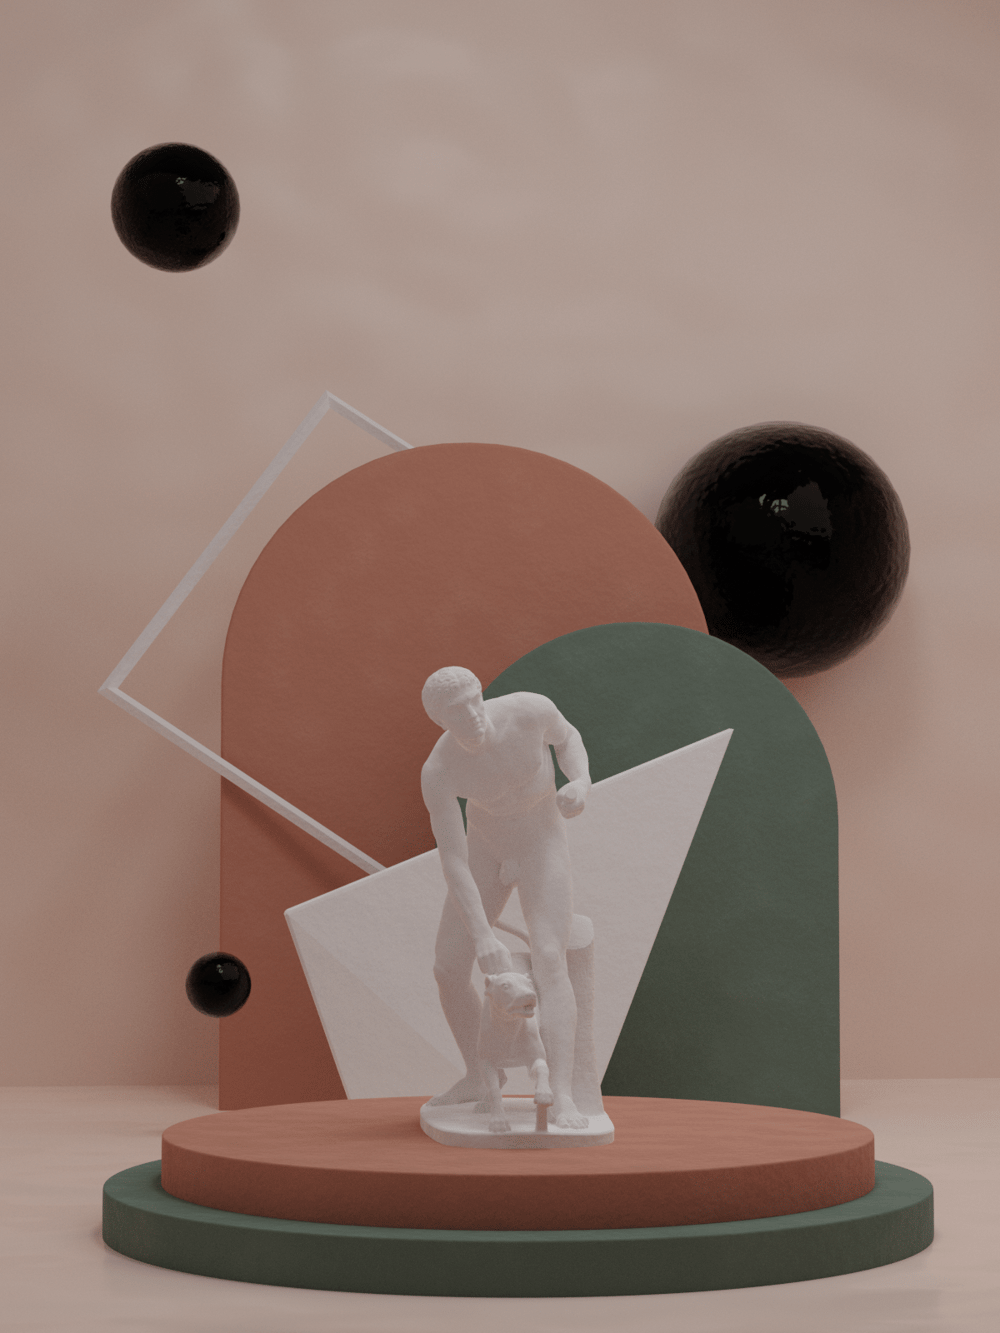 Minimal Geometric Scene - image 1 - student project